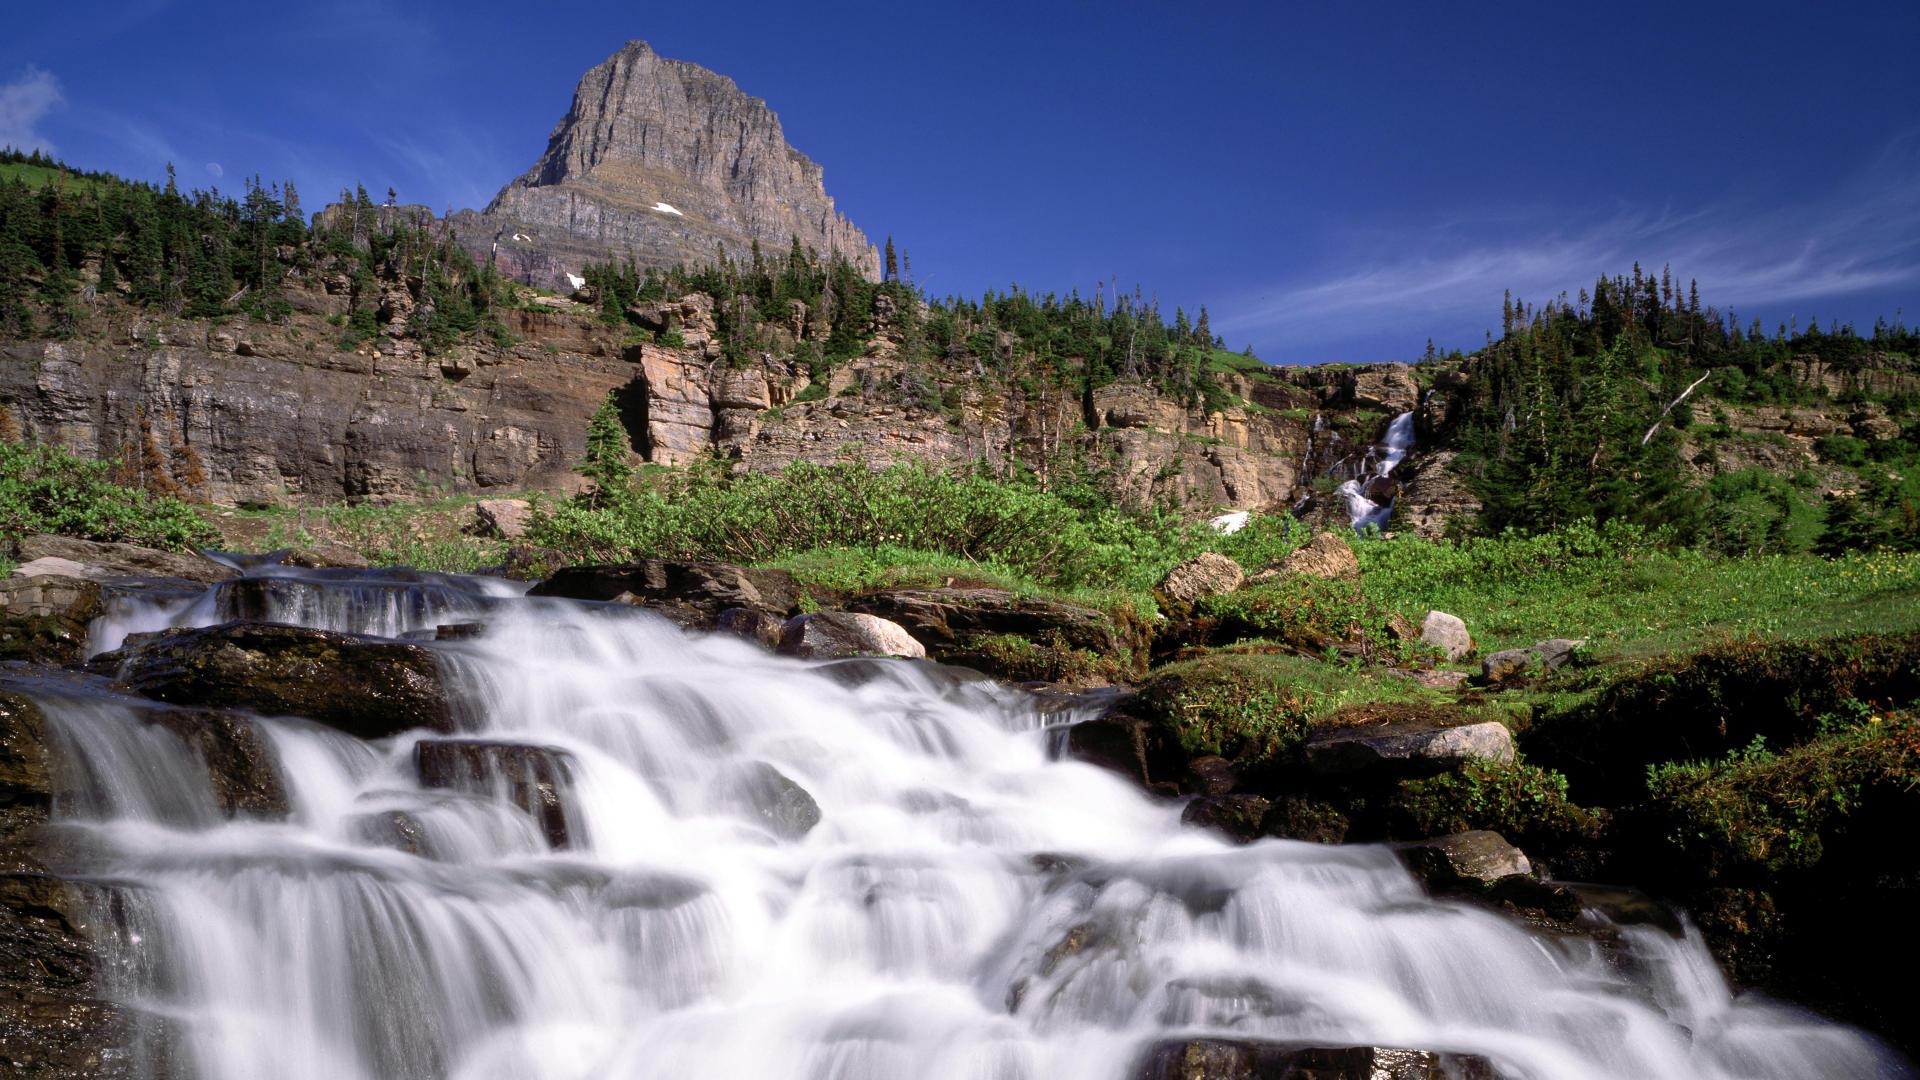 backgrounds park montana national glacier mountain cascade cool 1920x1080